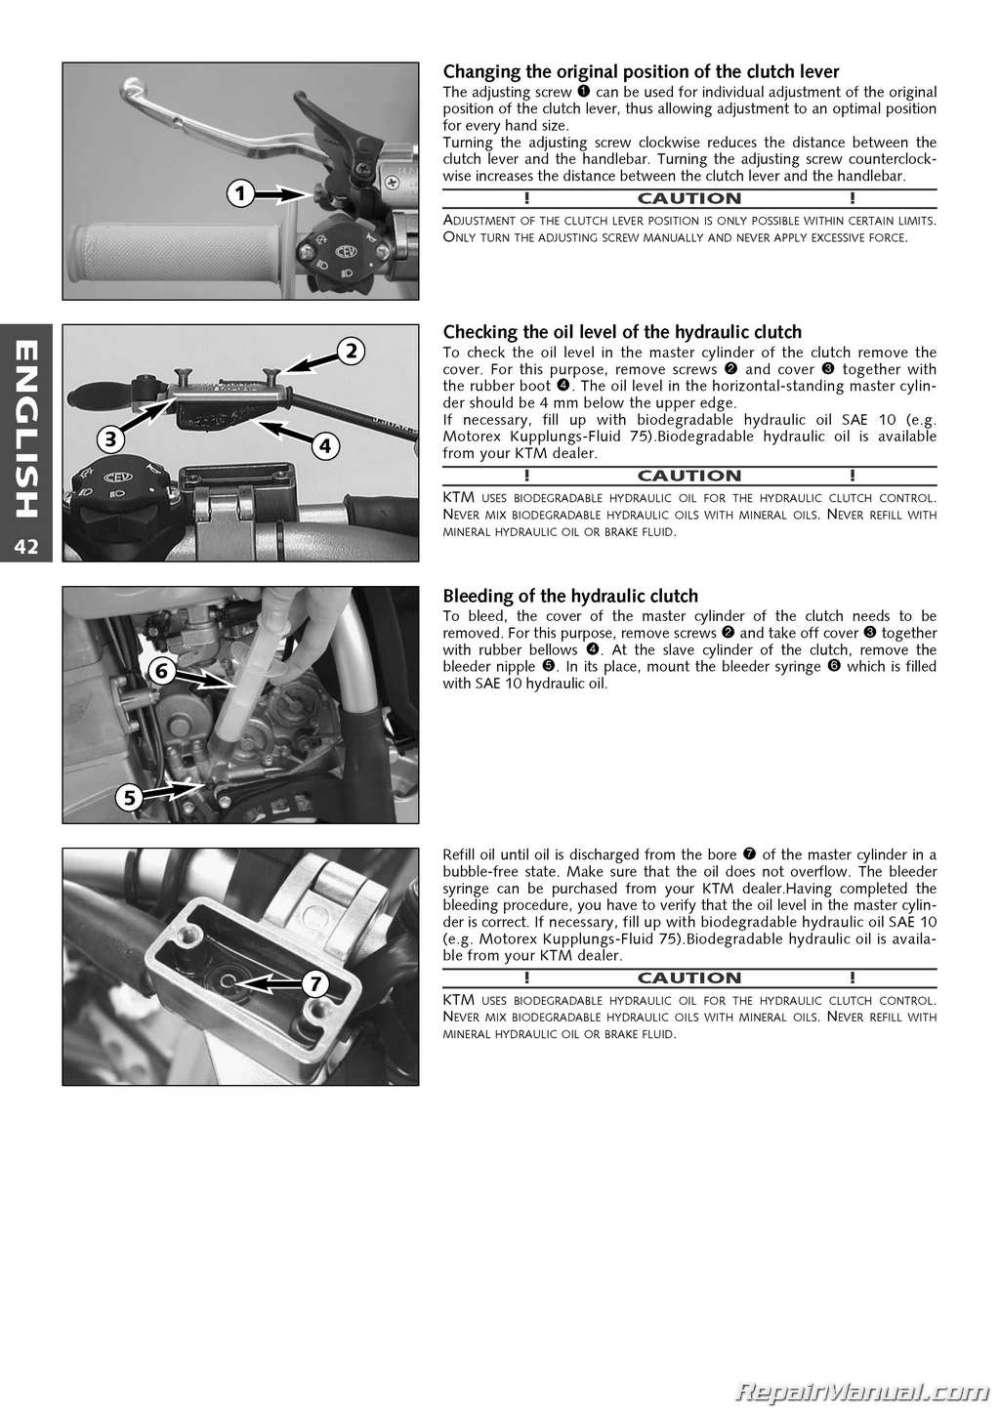 medium resolution of 2004 ktm 450 exc wiring diagram